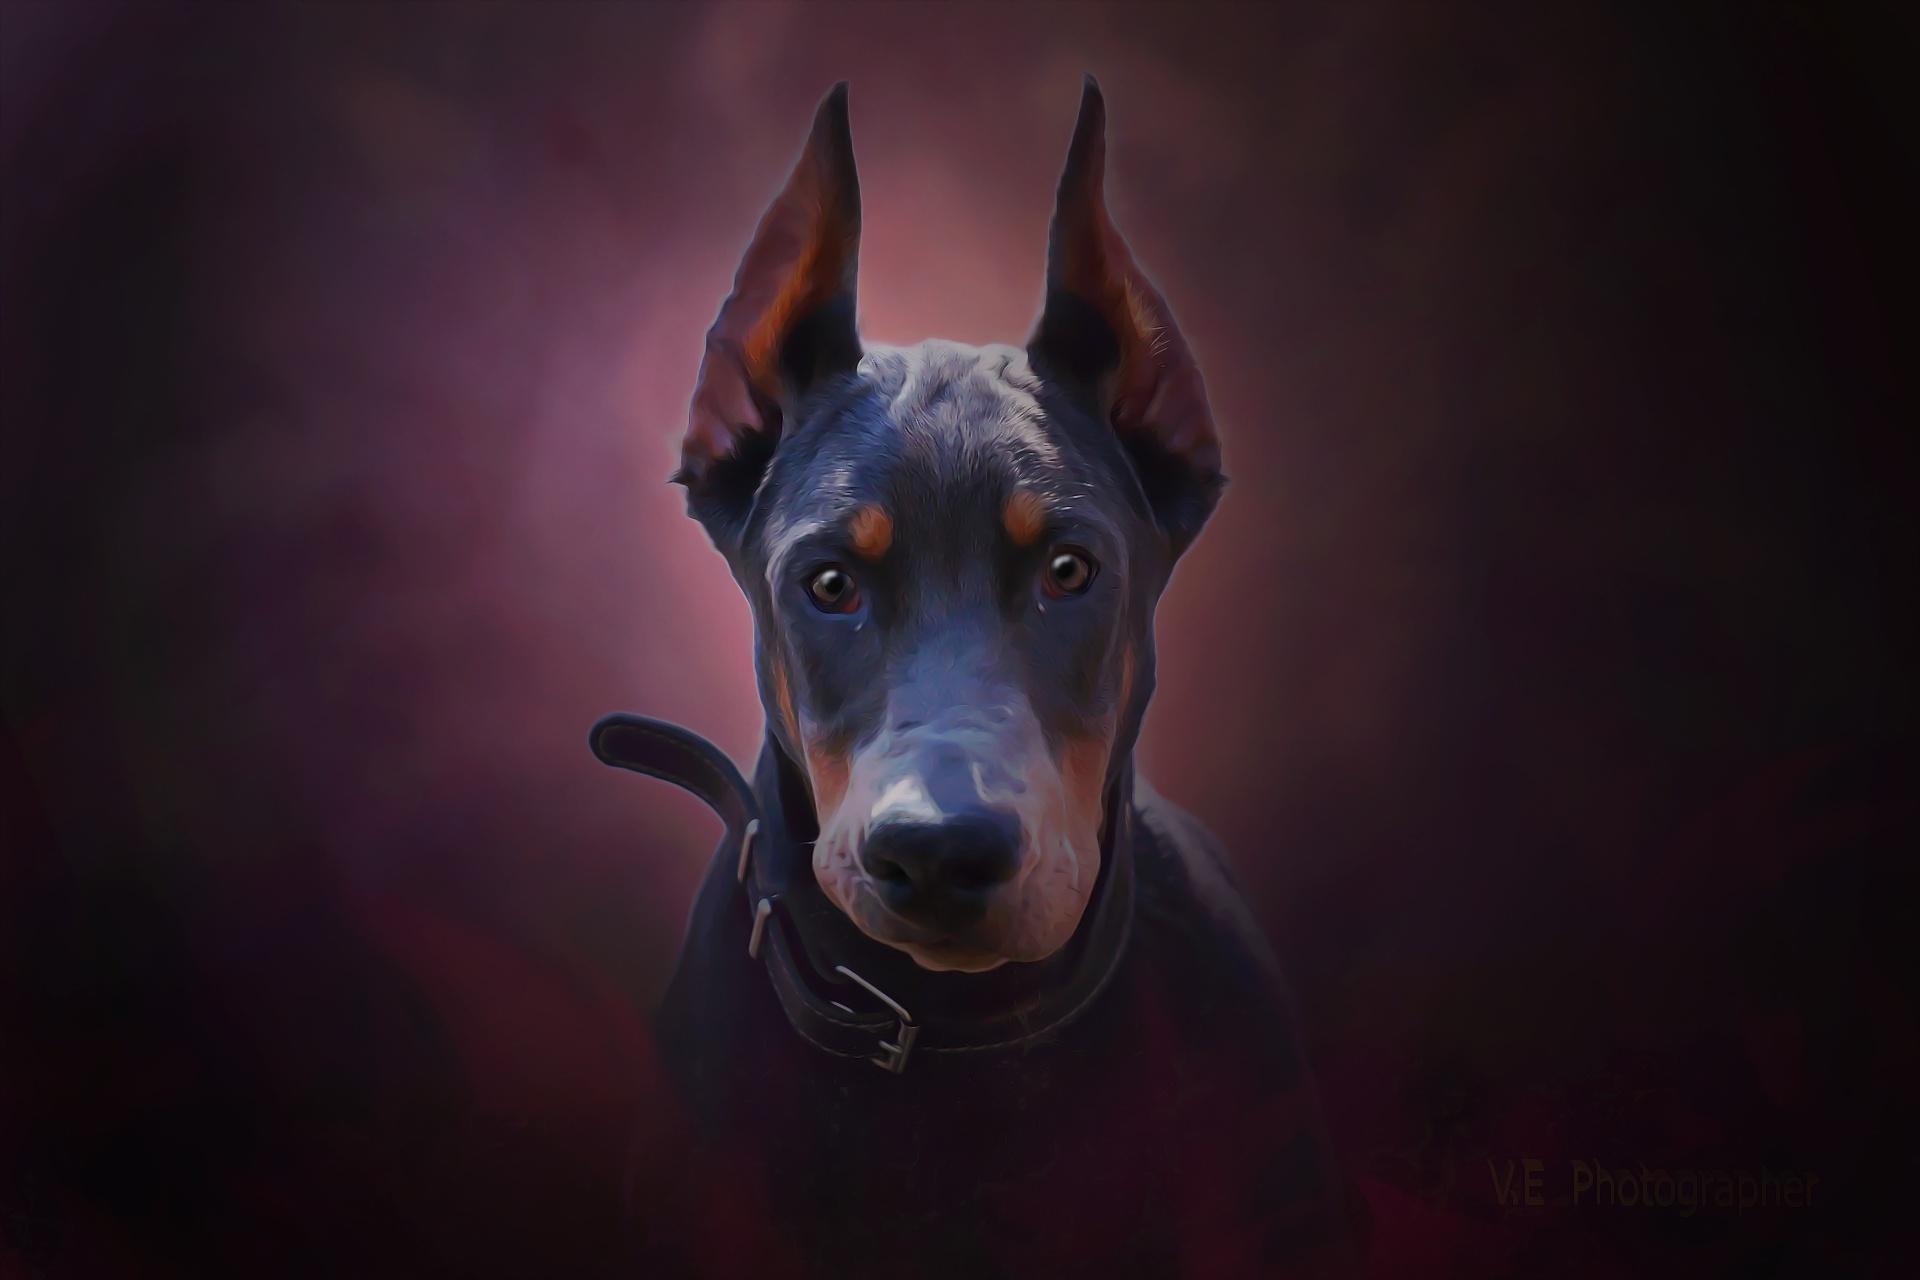 кроссовера картинки собак на рабочий стол доберман татуировку